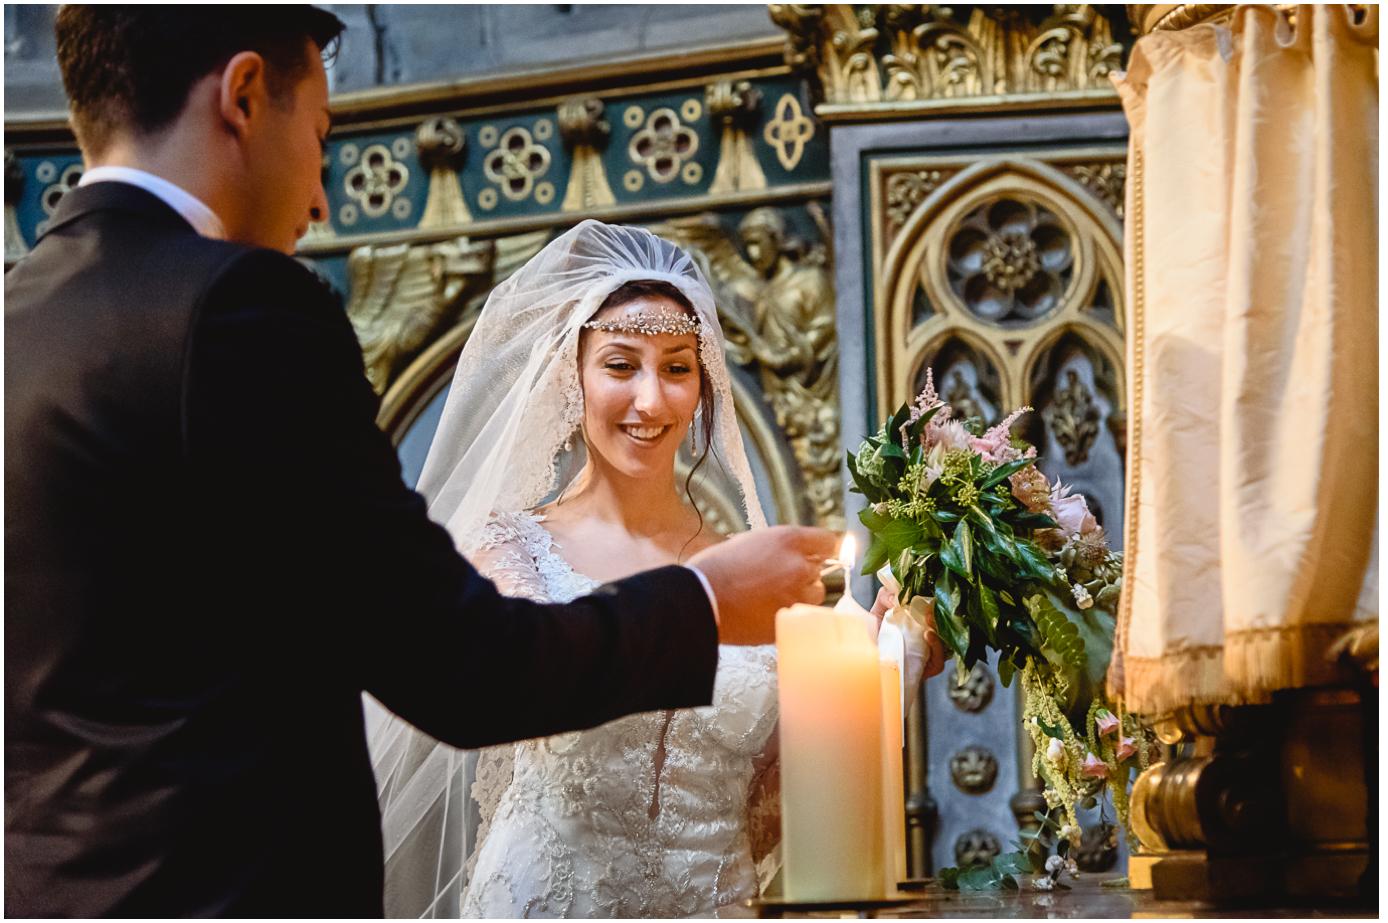 iranian wedding photographer 95 - Drapers Hall London Wedding Photographer